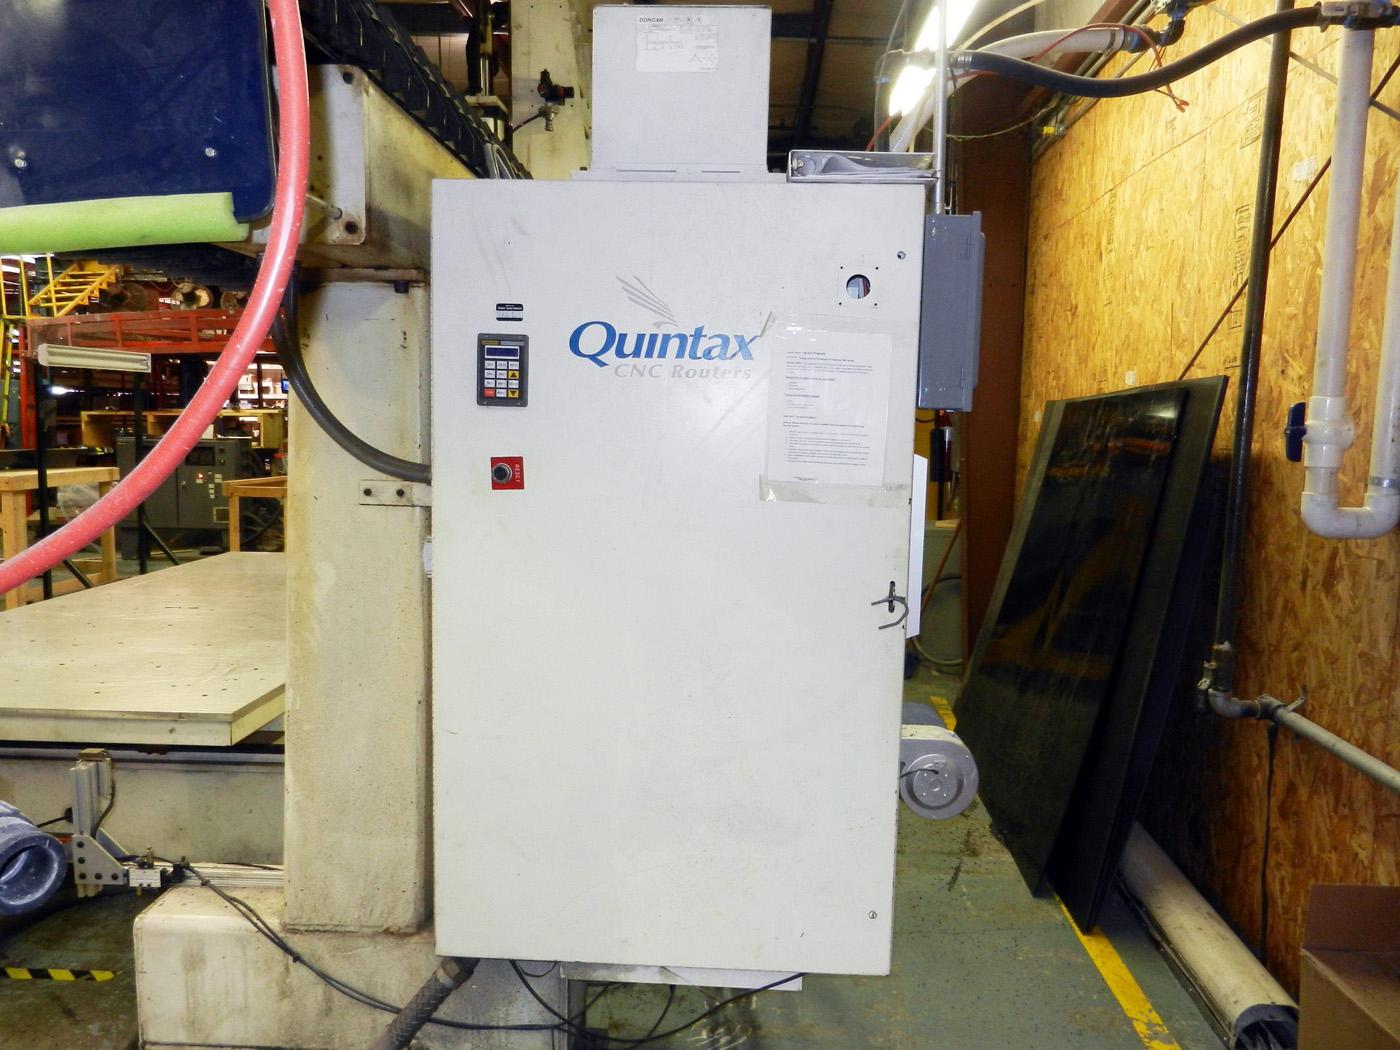 Quintax 5 Axis CNC Router E537